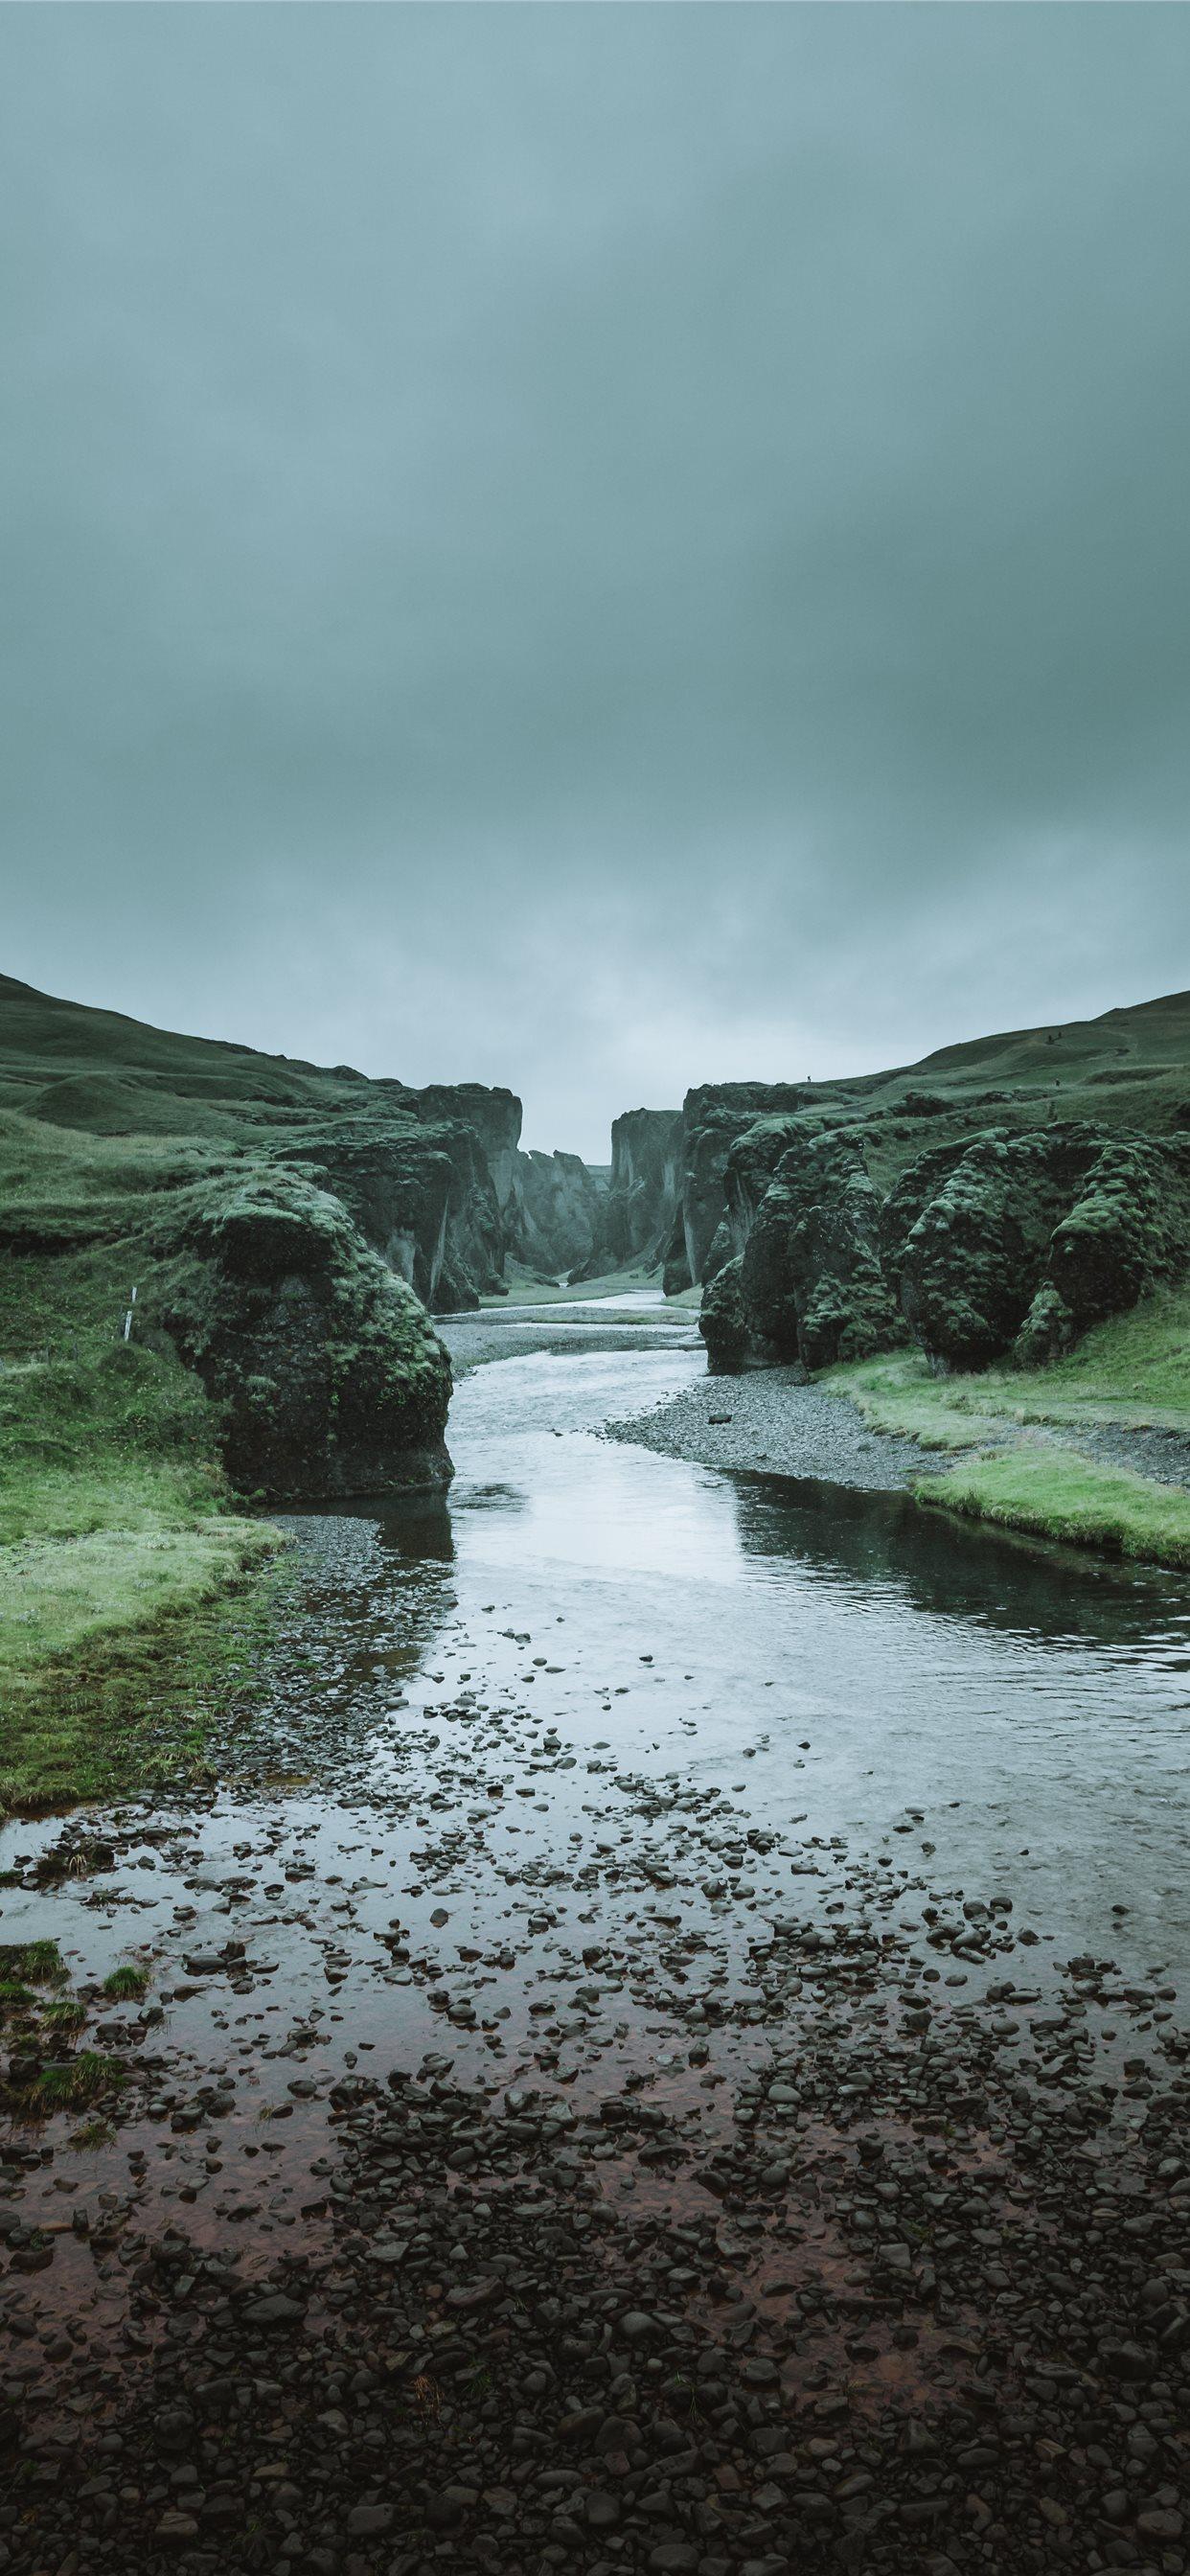 River Stream Coast Steep Stony Ditch Faroe Islands iPhone X 1242x2688